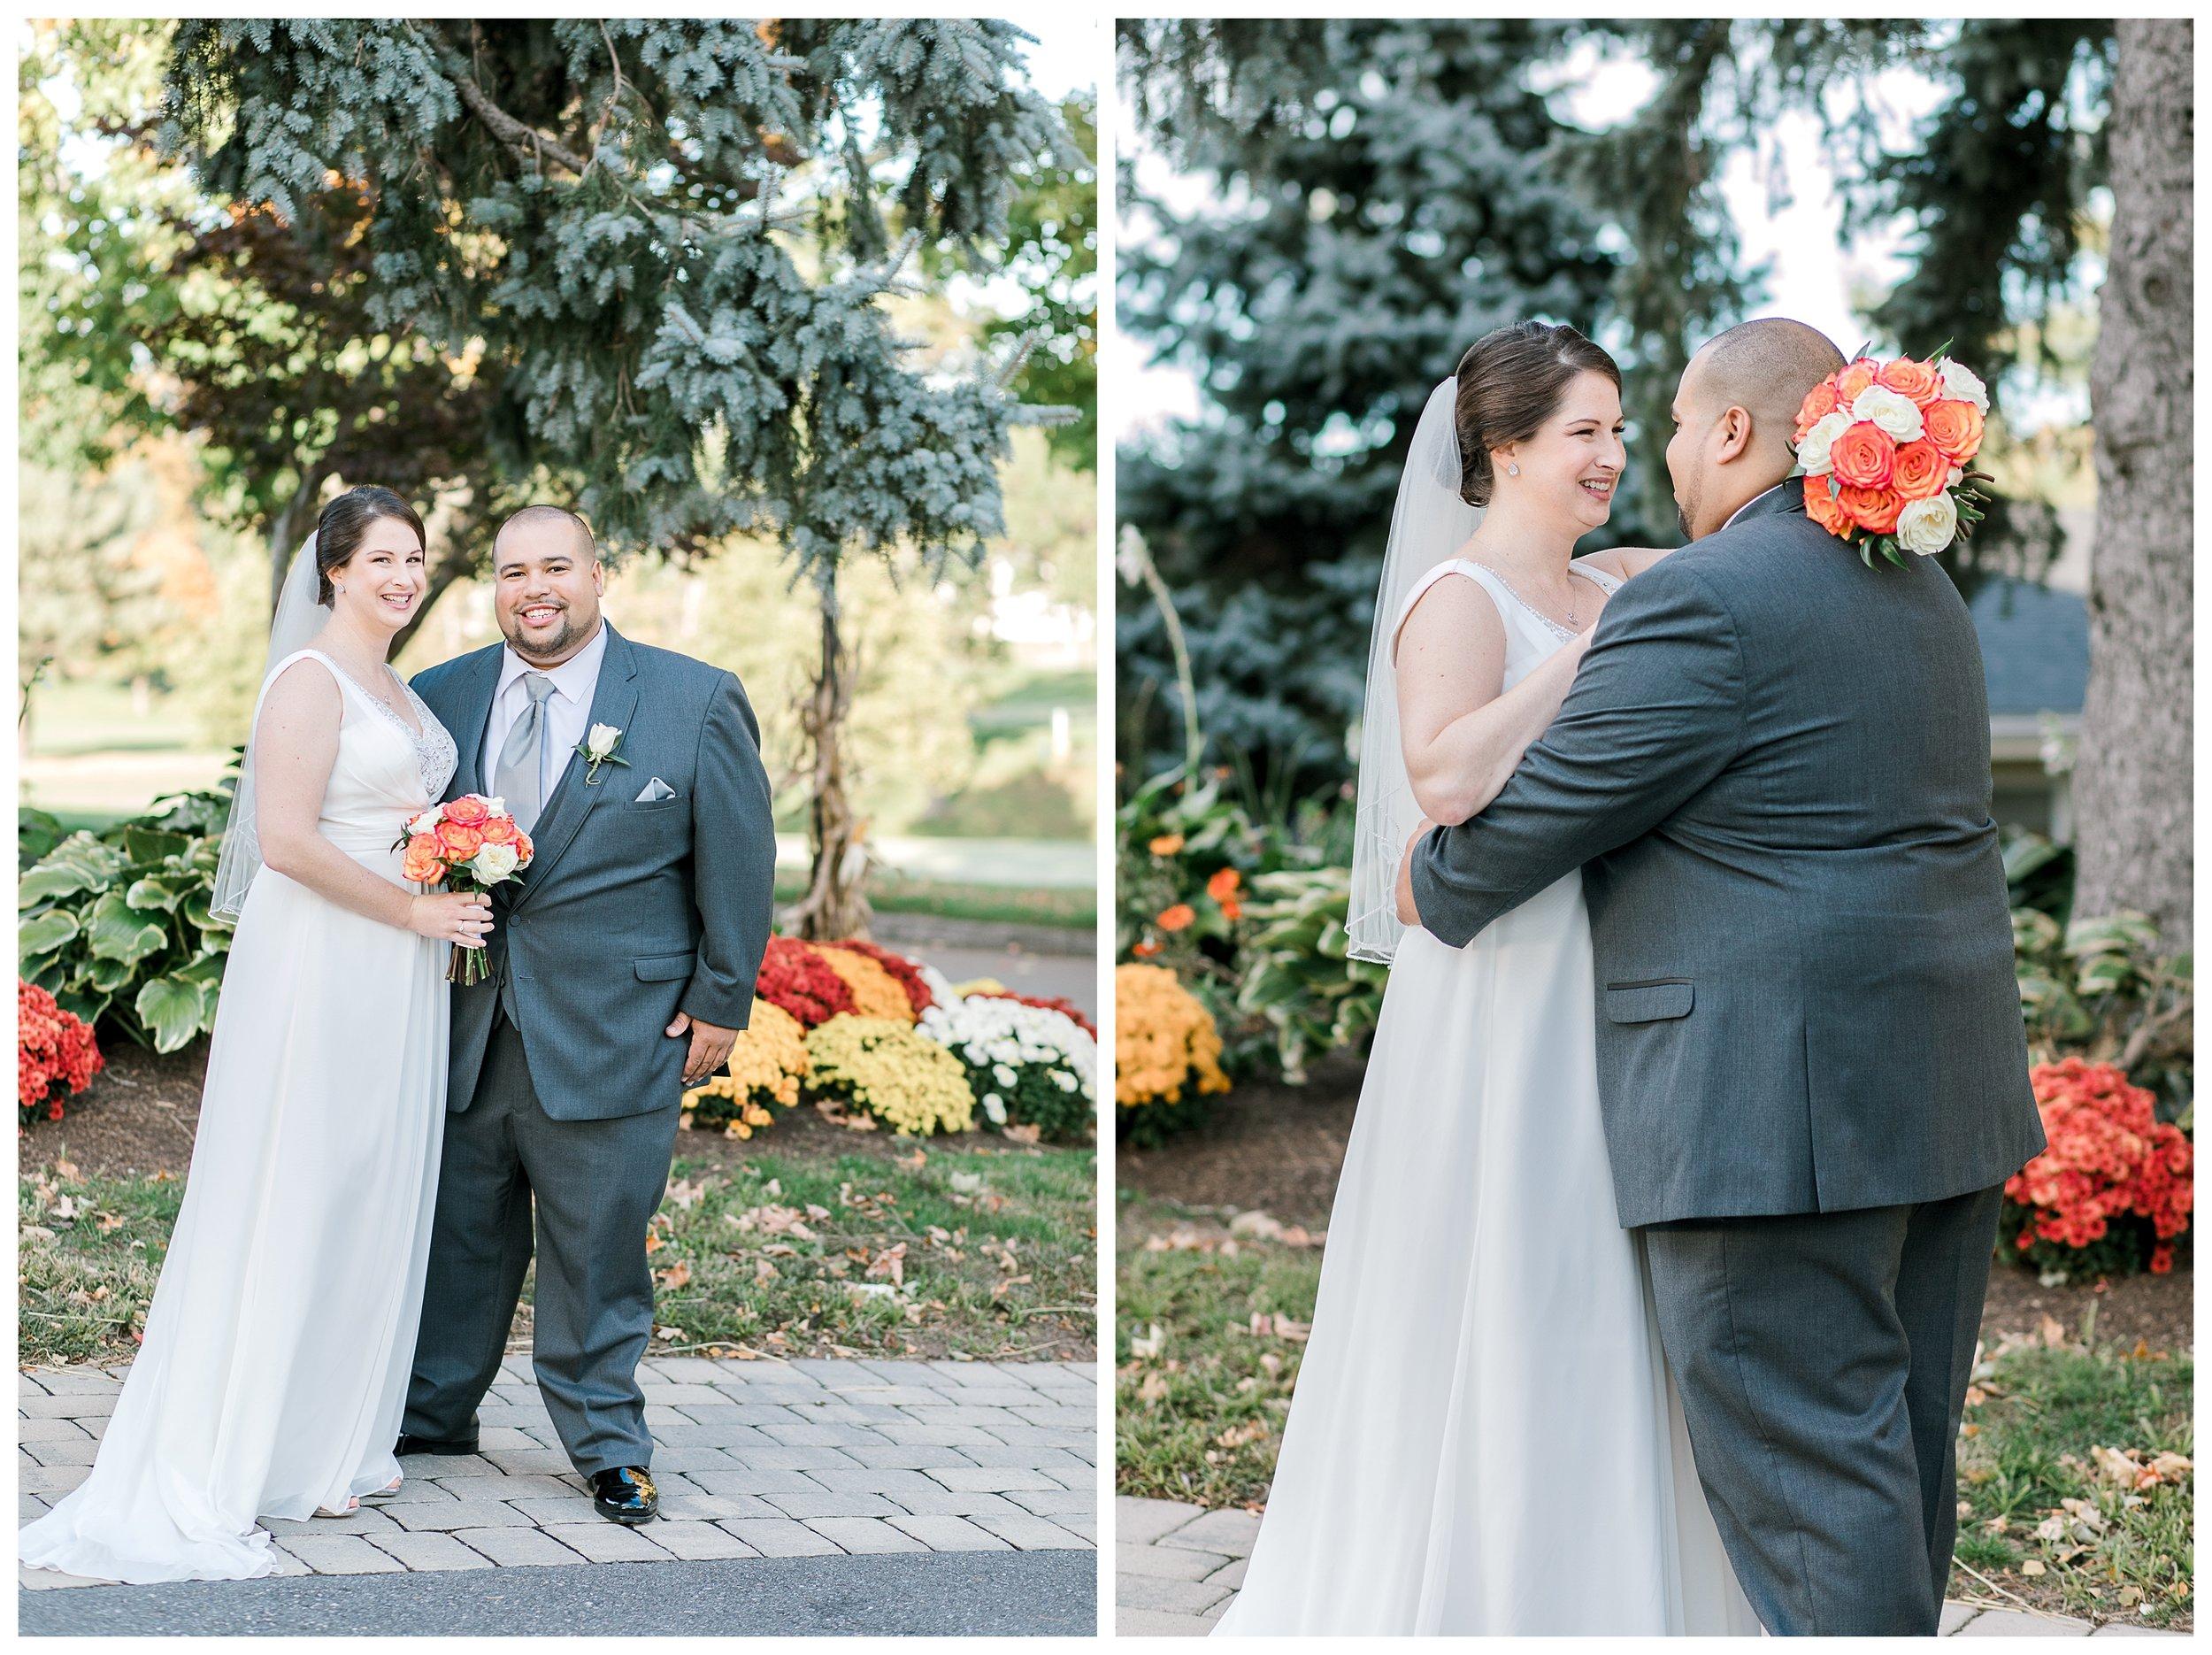 pleasant_valley_country_club_wedding_sutton_erica_pezente_photography (23).jpg